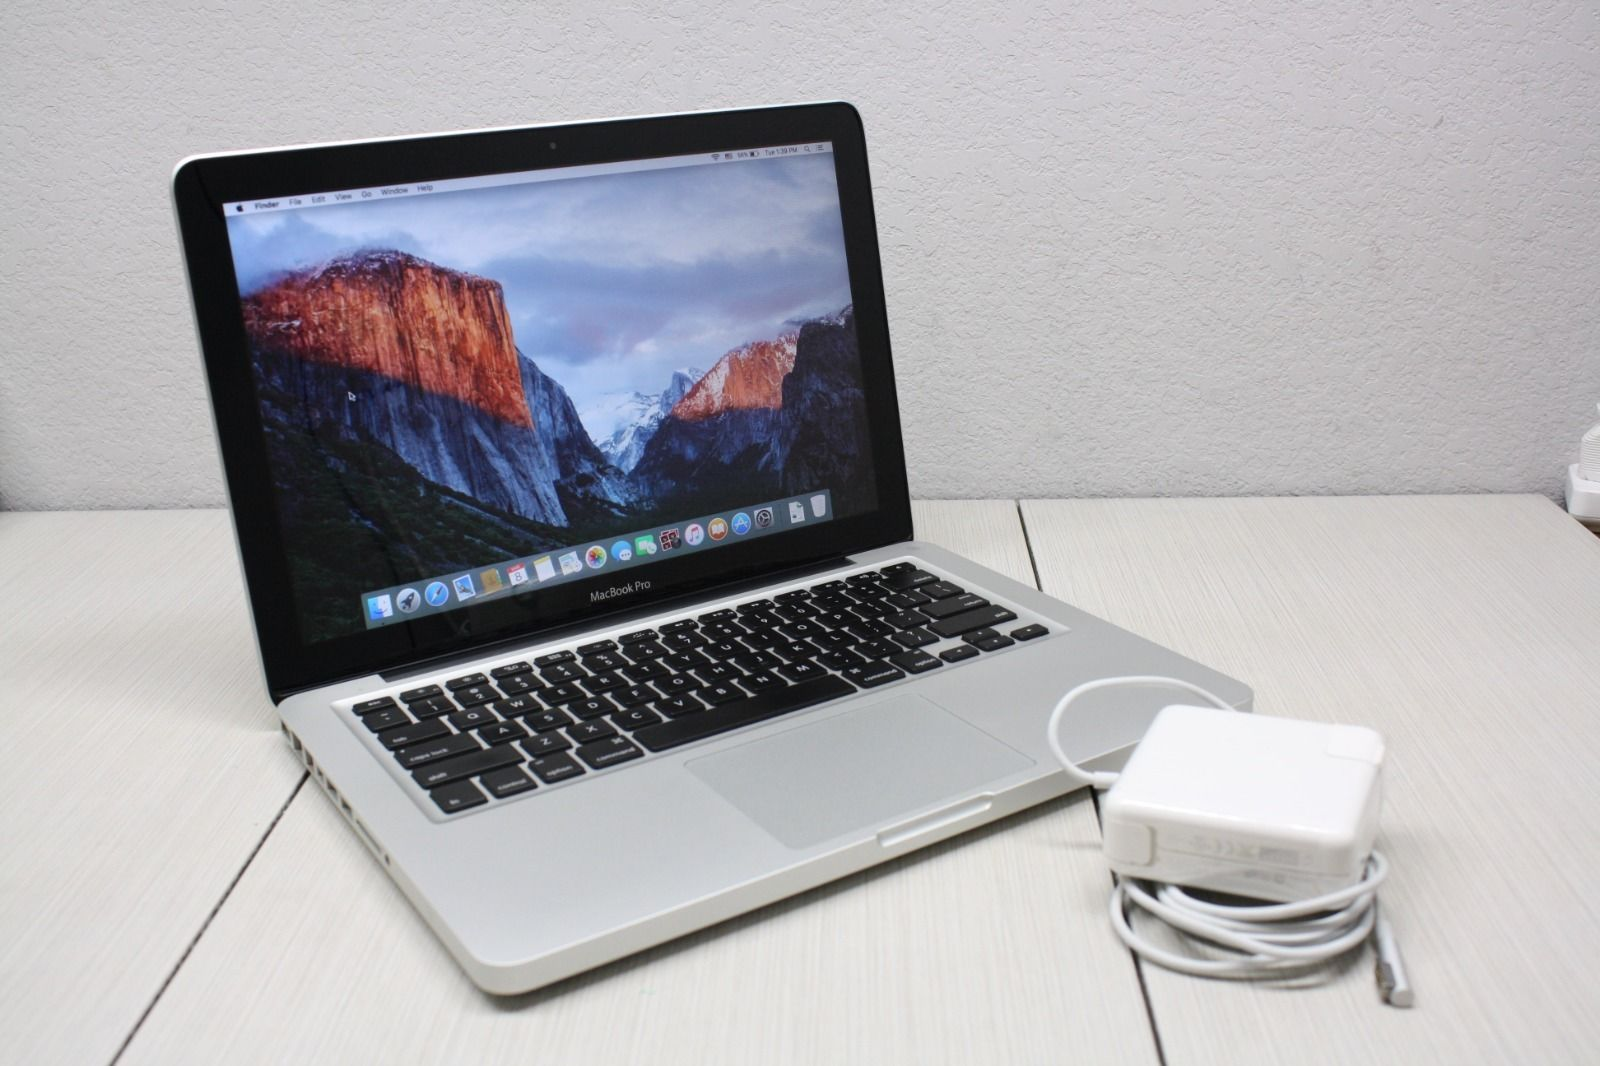 MacBook Pro 2012 MAC OS Sierra